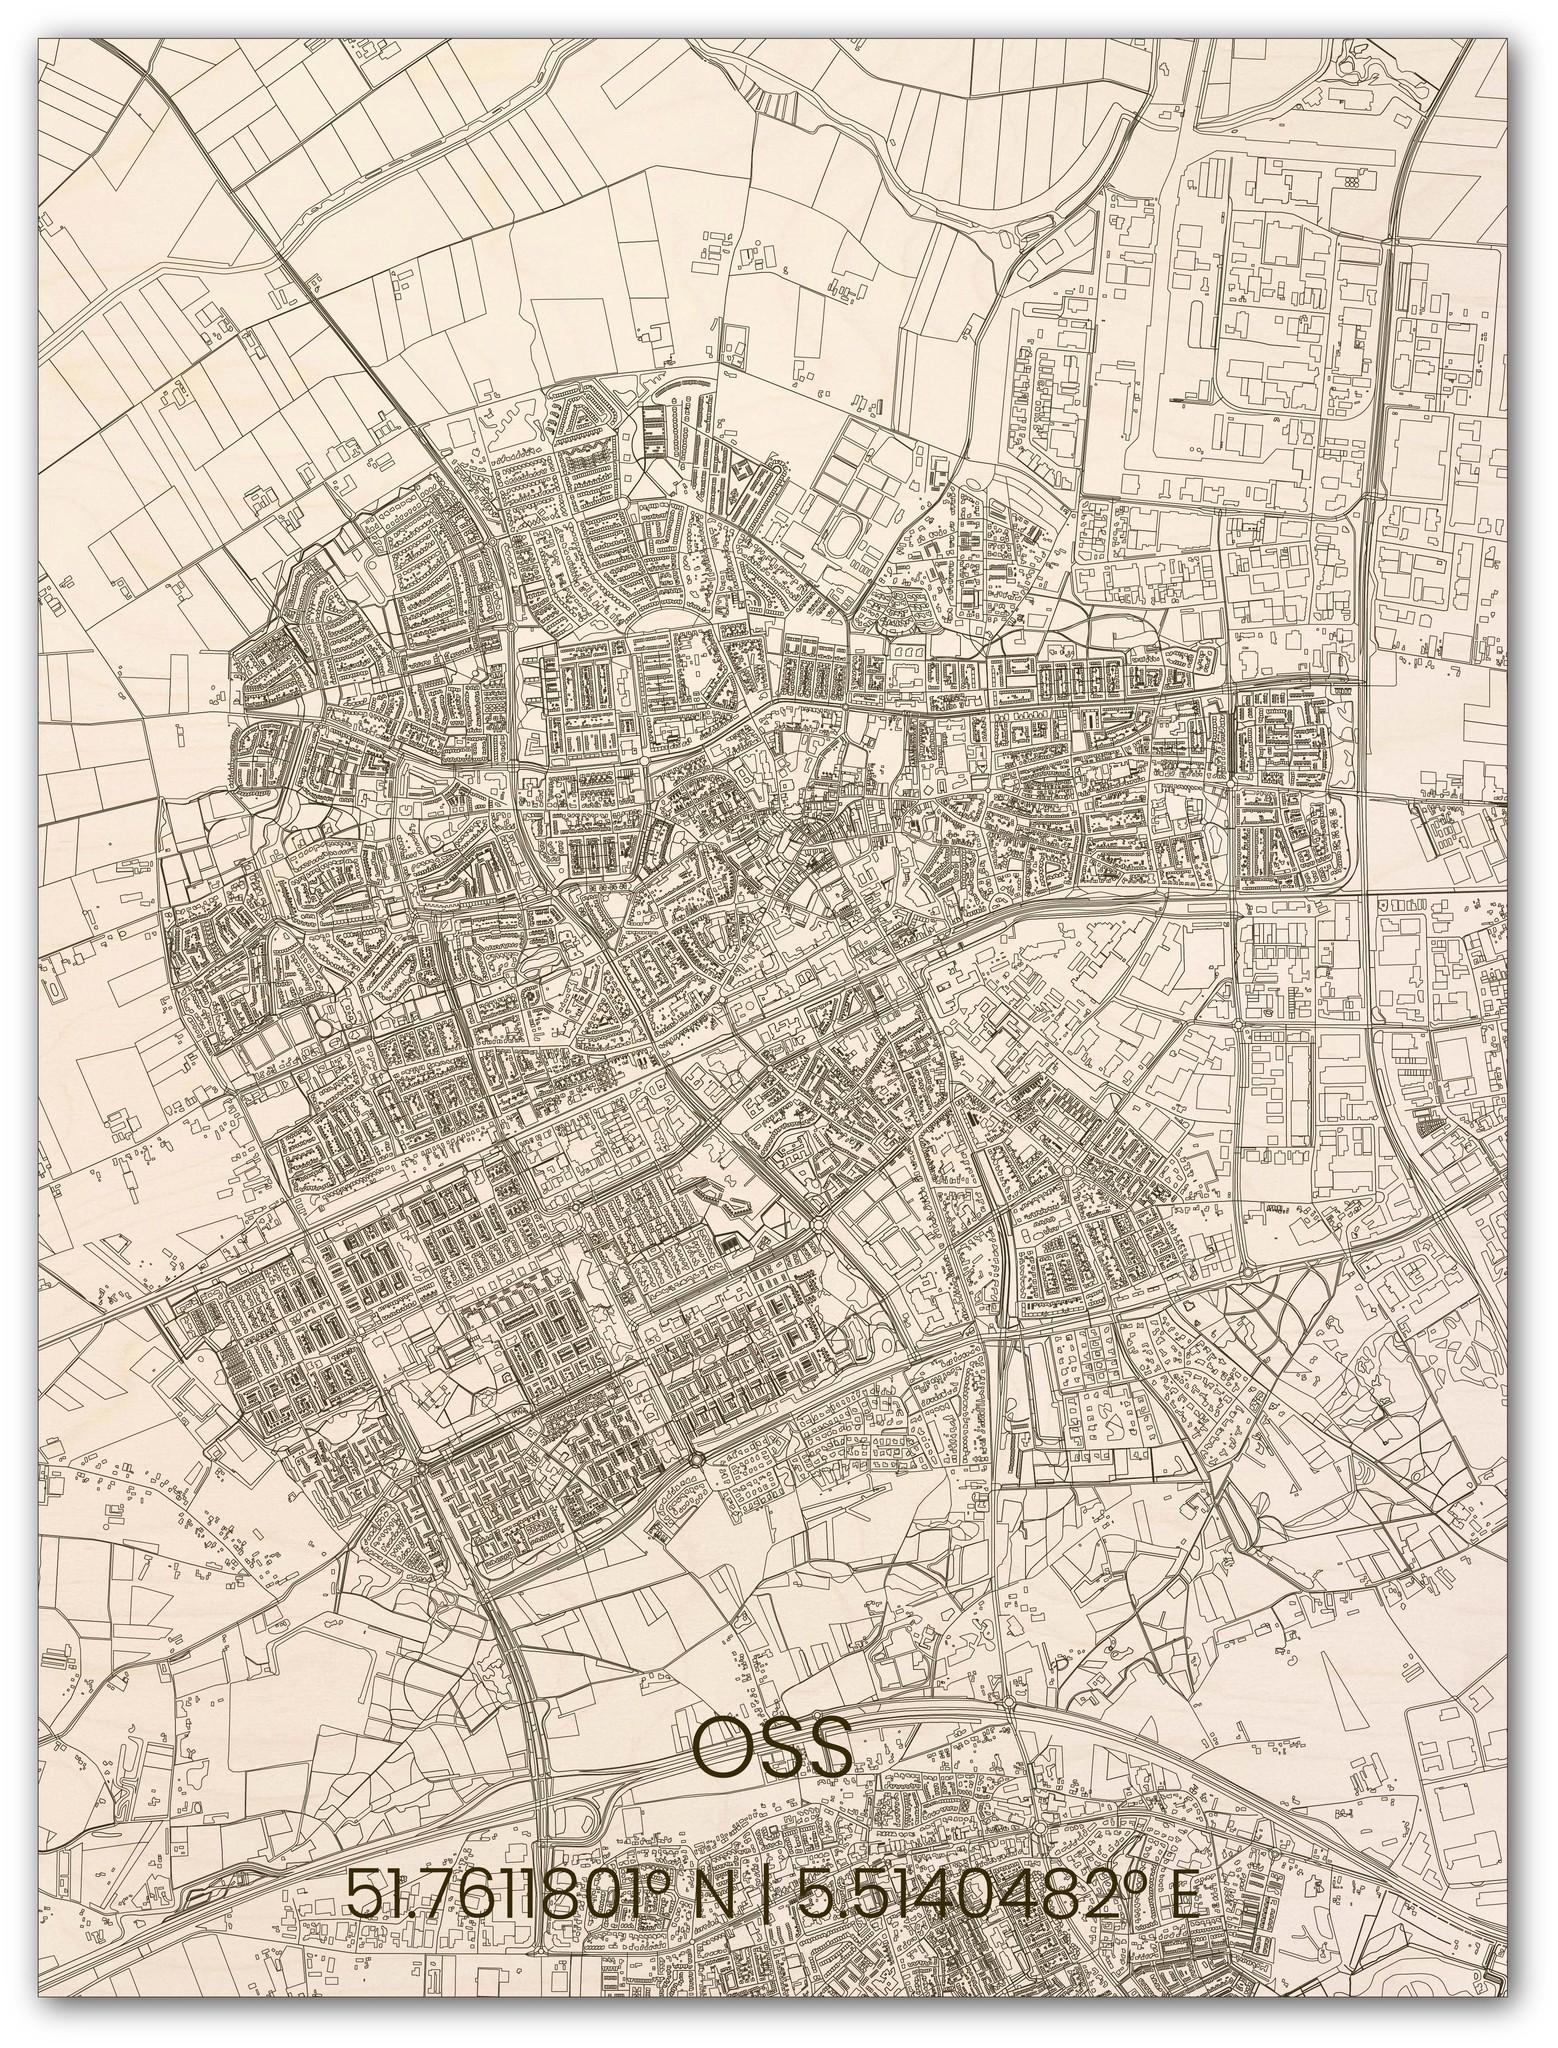 Houten stadsplattegrond Oss-1